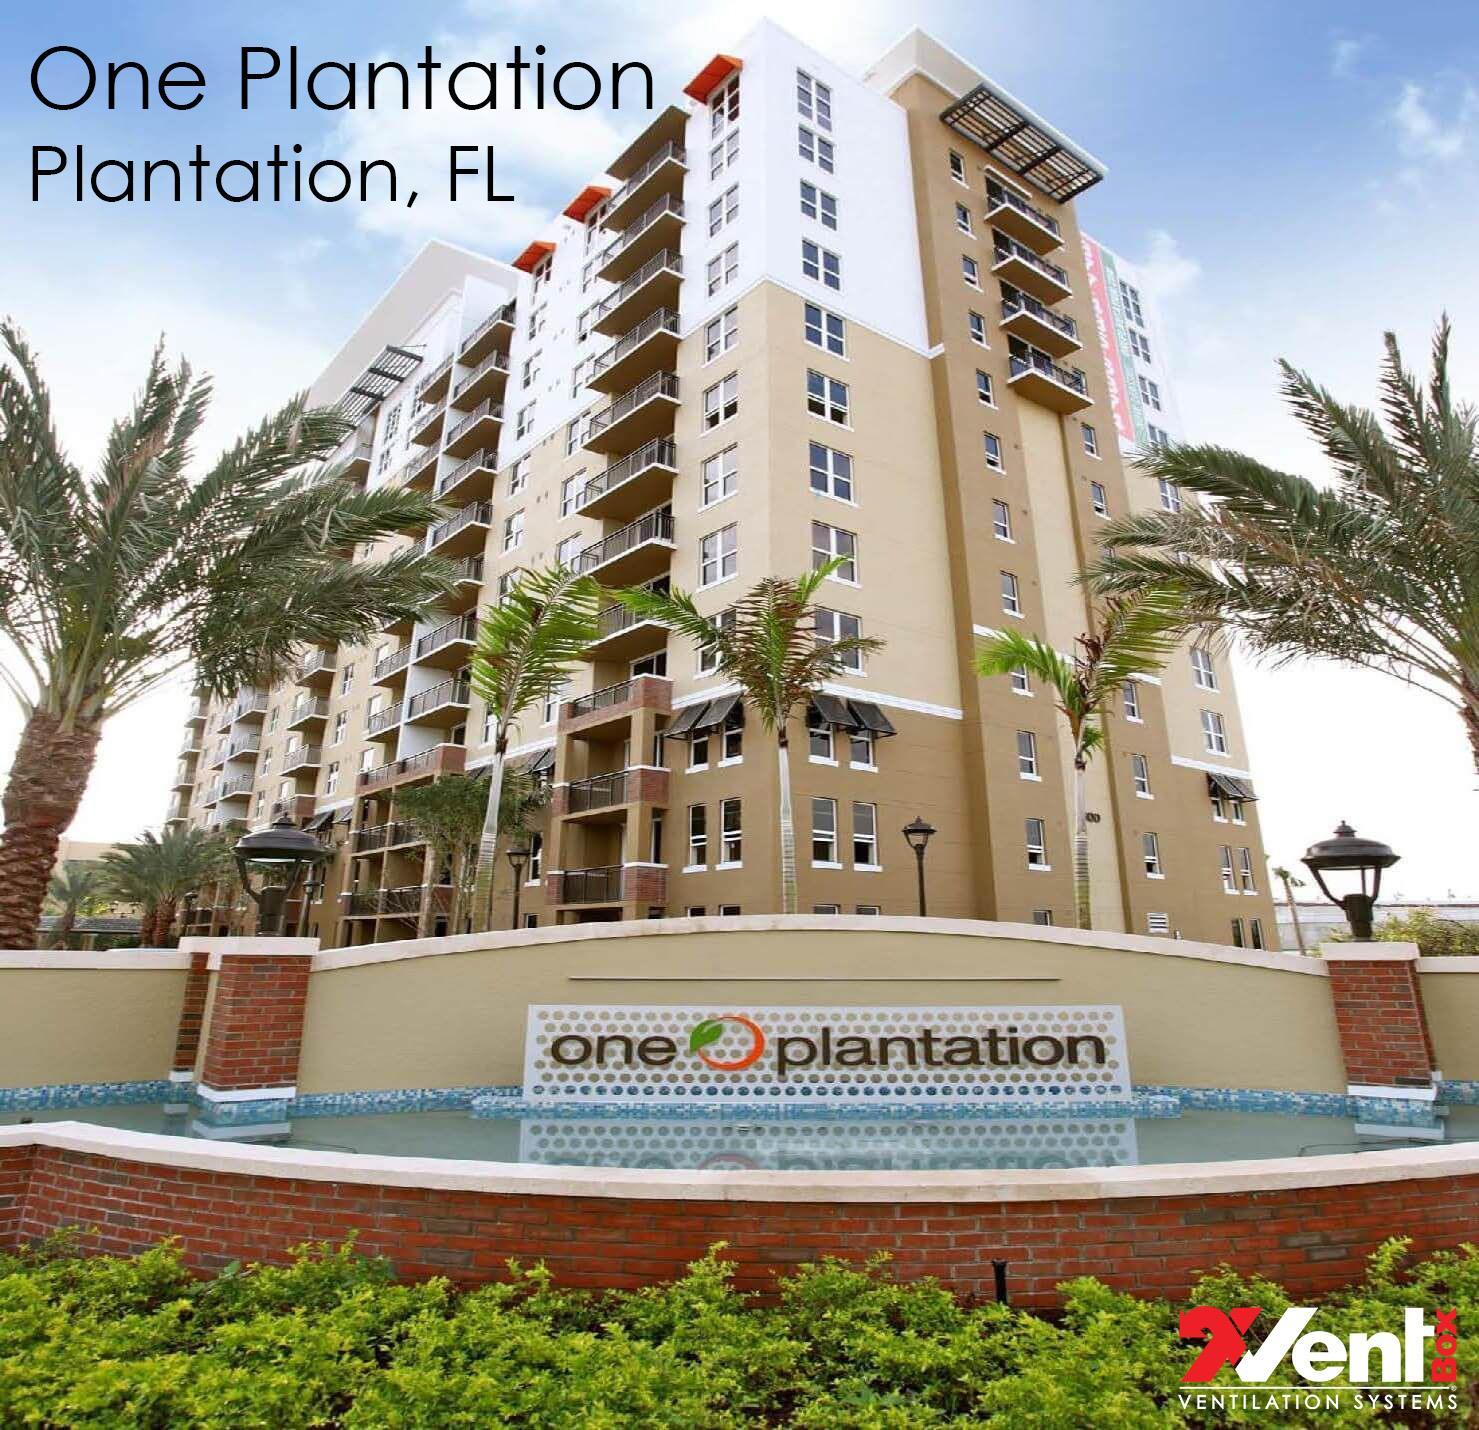 One Plantation